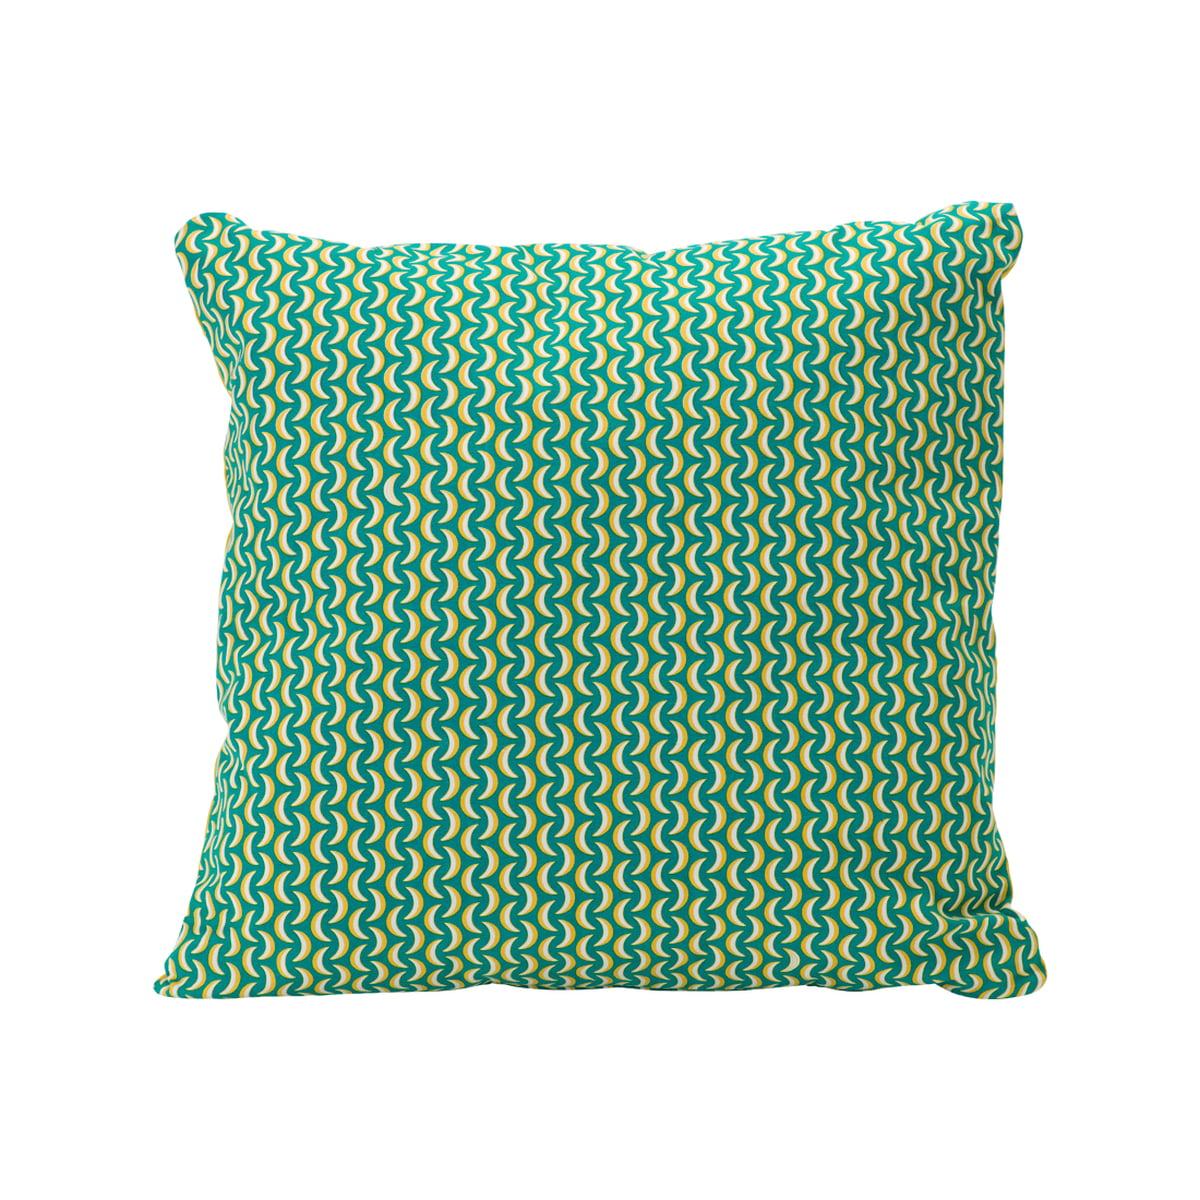 cushion bananes 70 x 70 cm by fermob. Black Bedroom Furniture Sets. Home Design Ideas